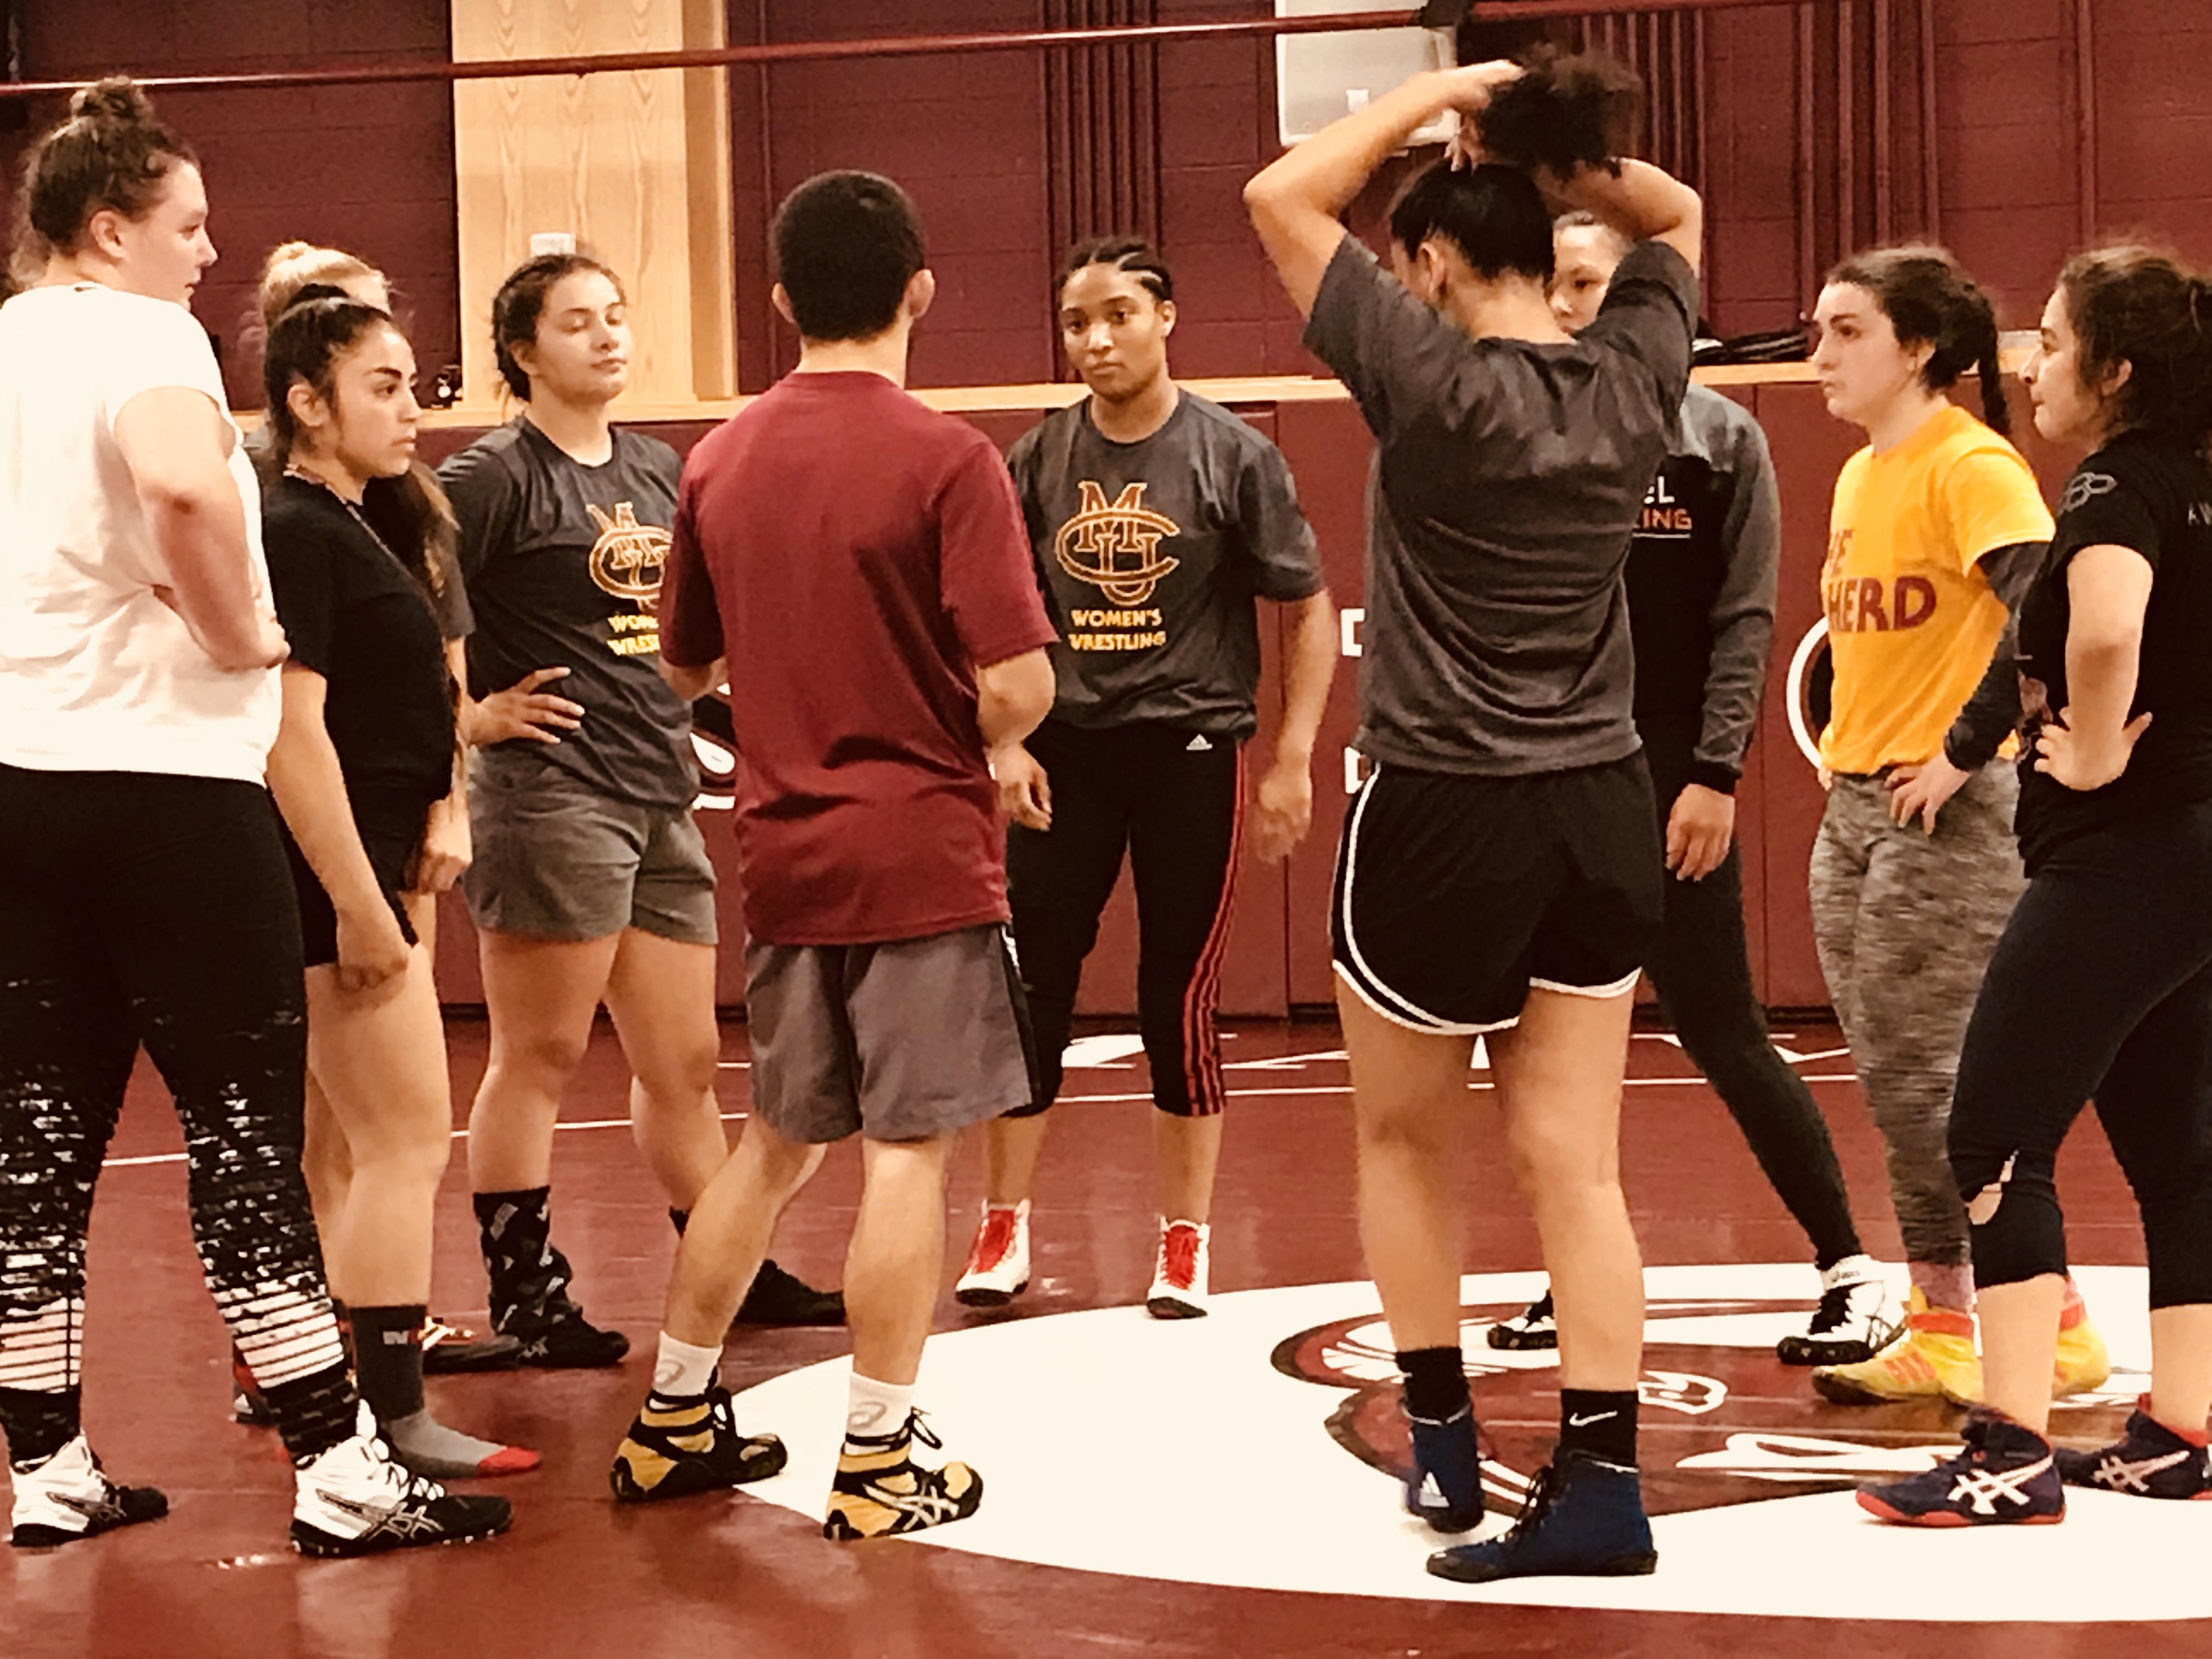 Meet the women wrestlers